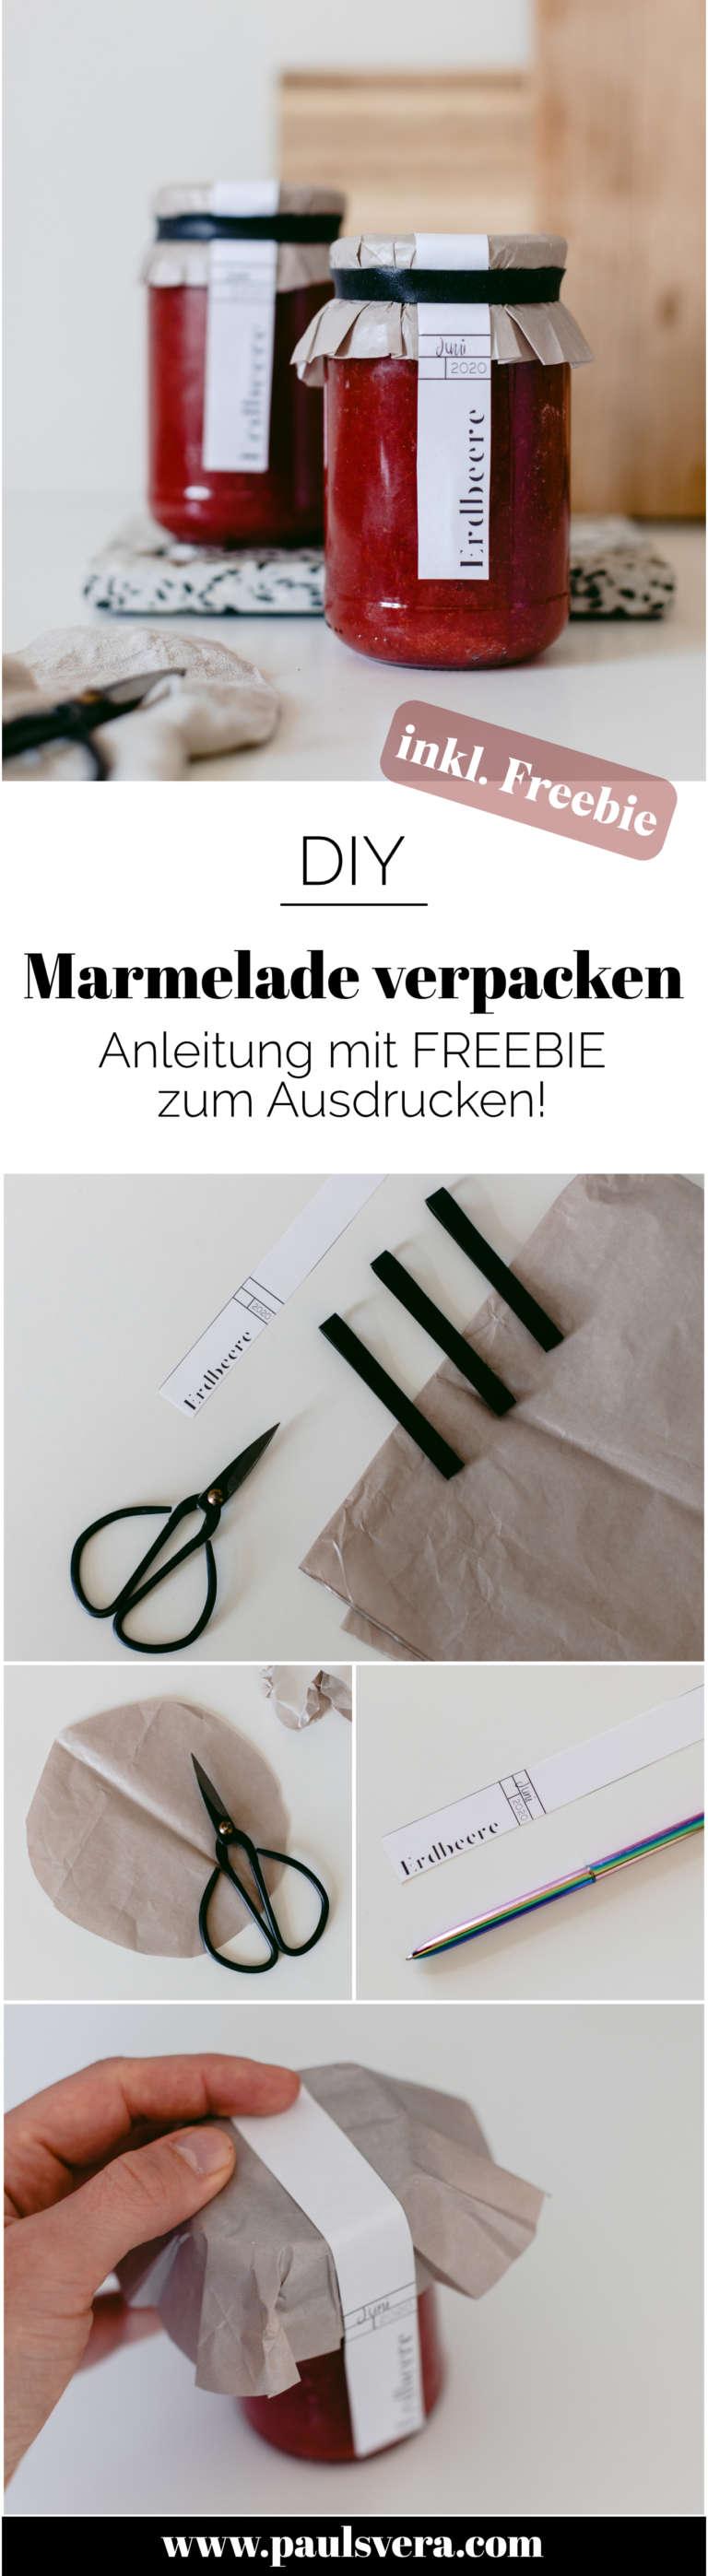 Anleitung Marmelade verpacken Etiketten2